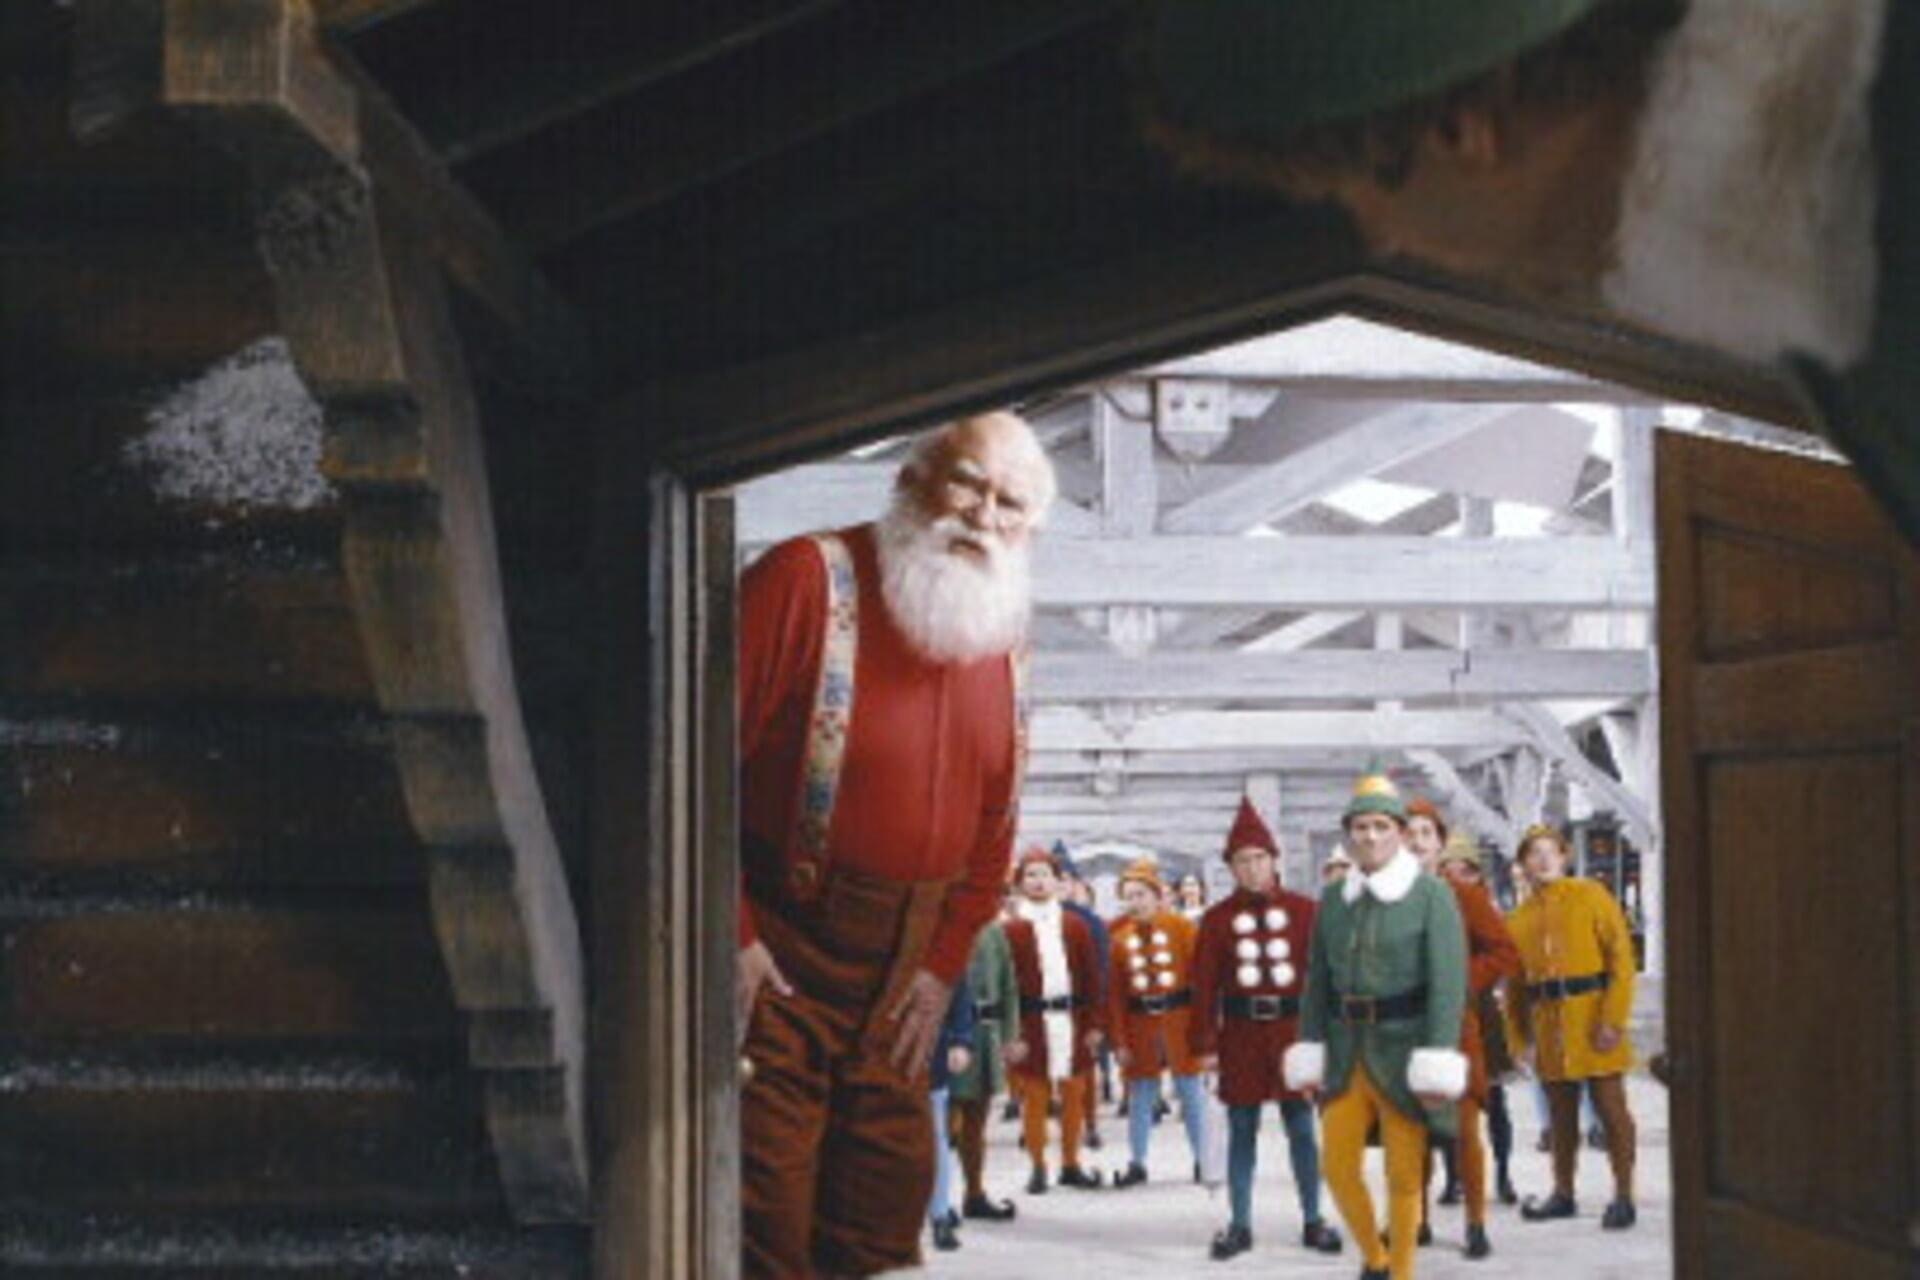 Elf - Image 20